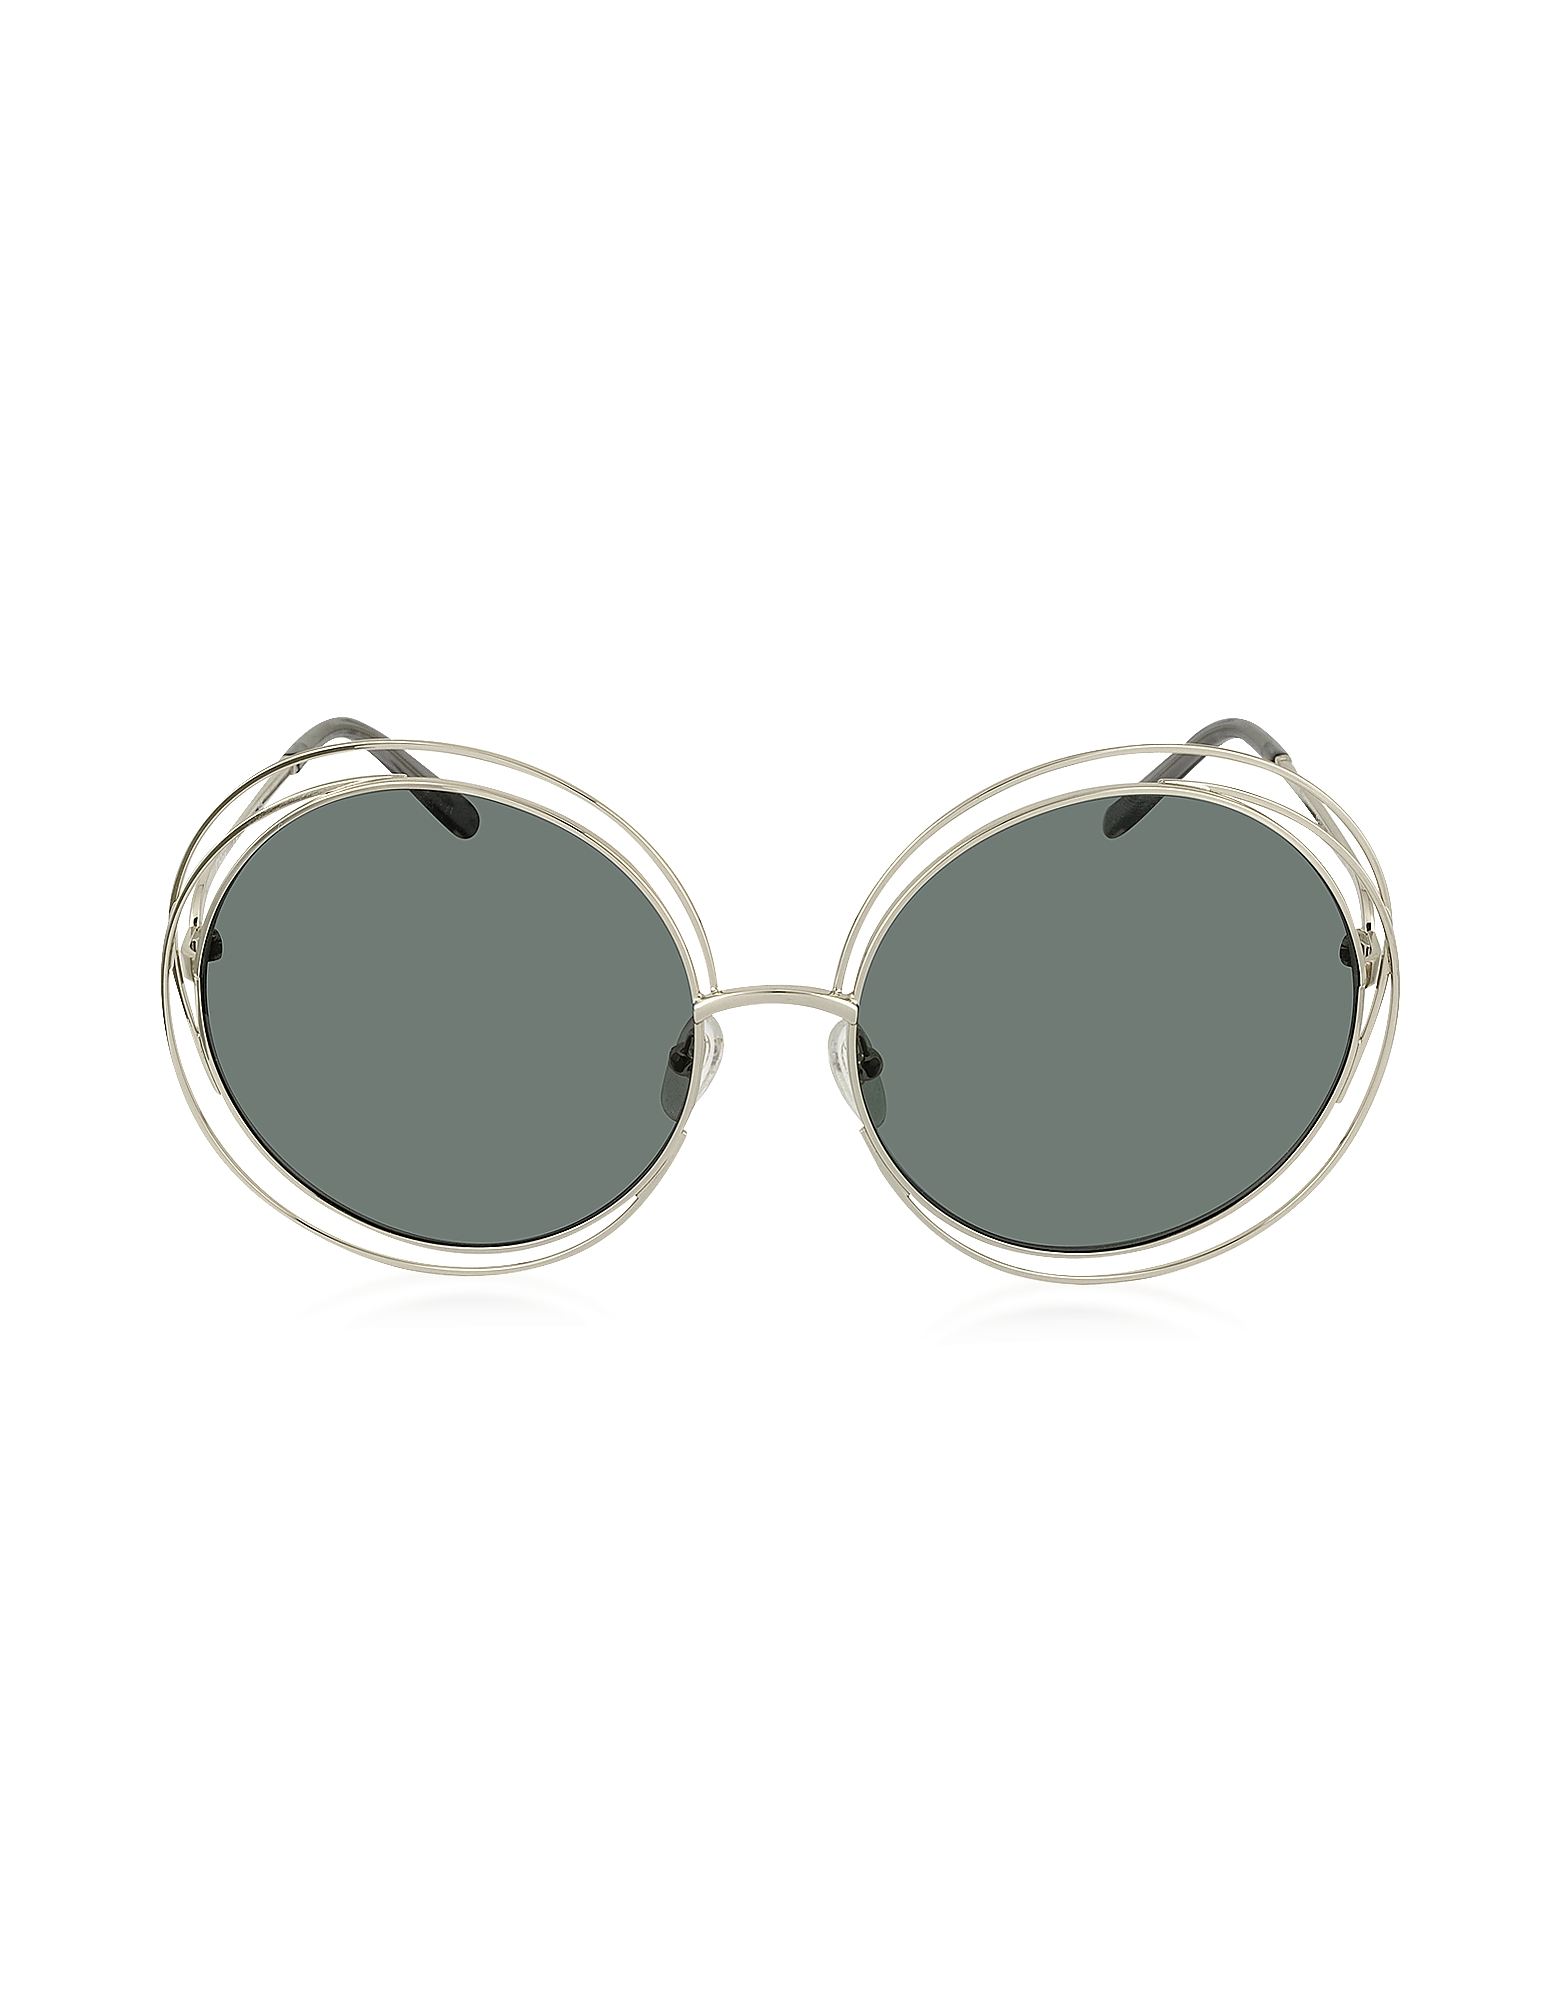 Chloe Sunglasses, CARLINA CE 114S Metal Oval Women's Sunglasses